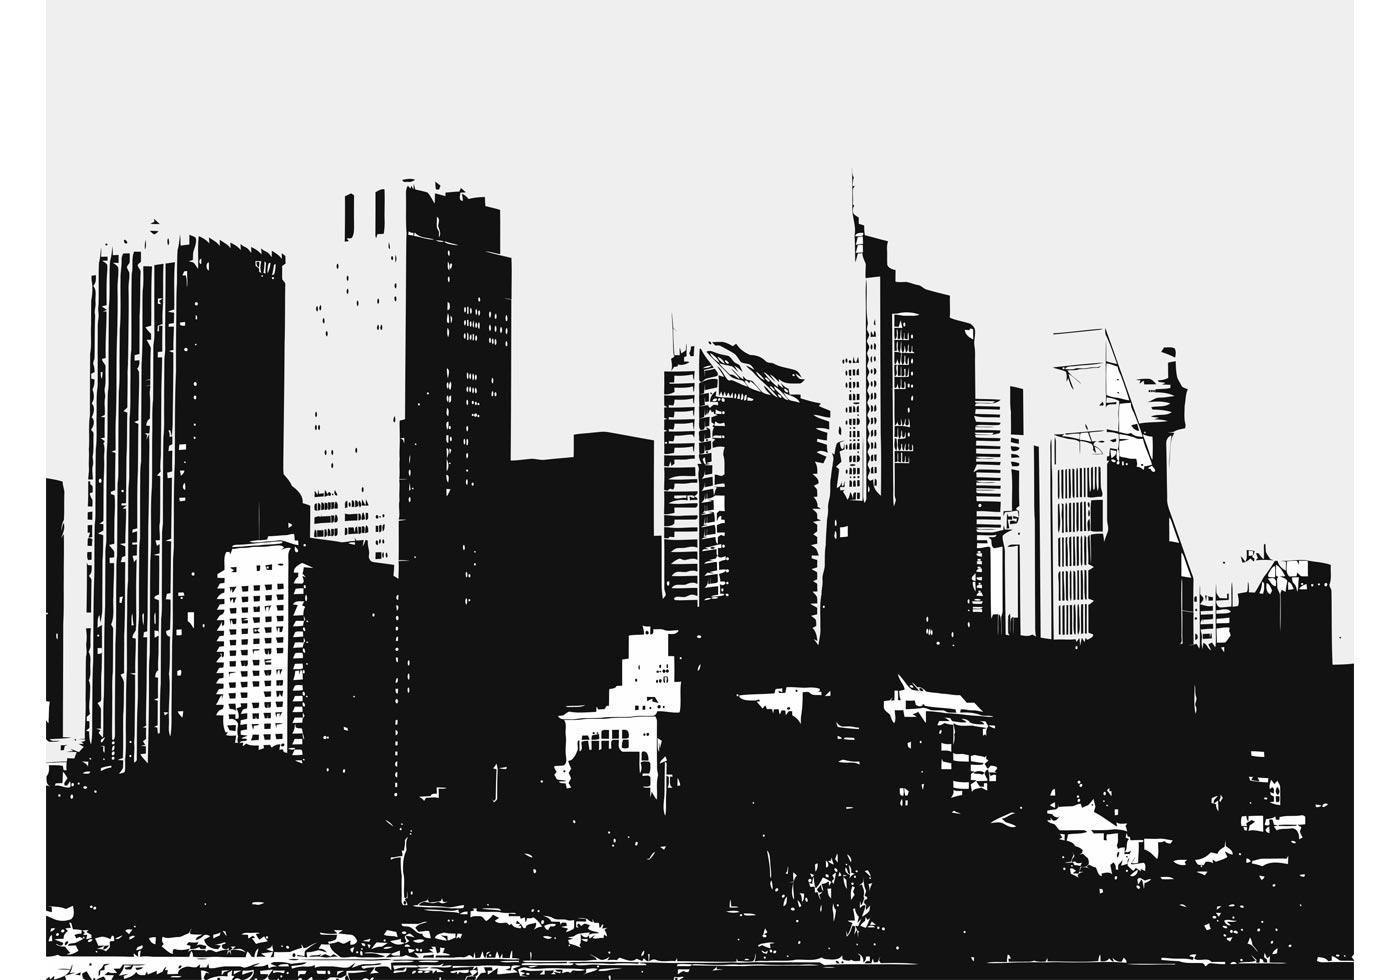 Big City Buildings - Download Free Vector Art, Stock ...